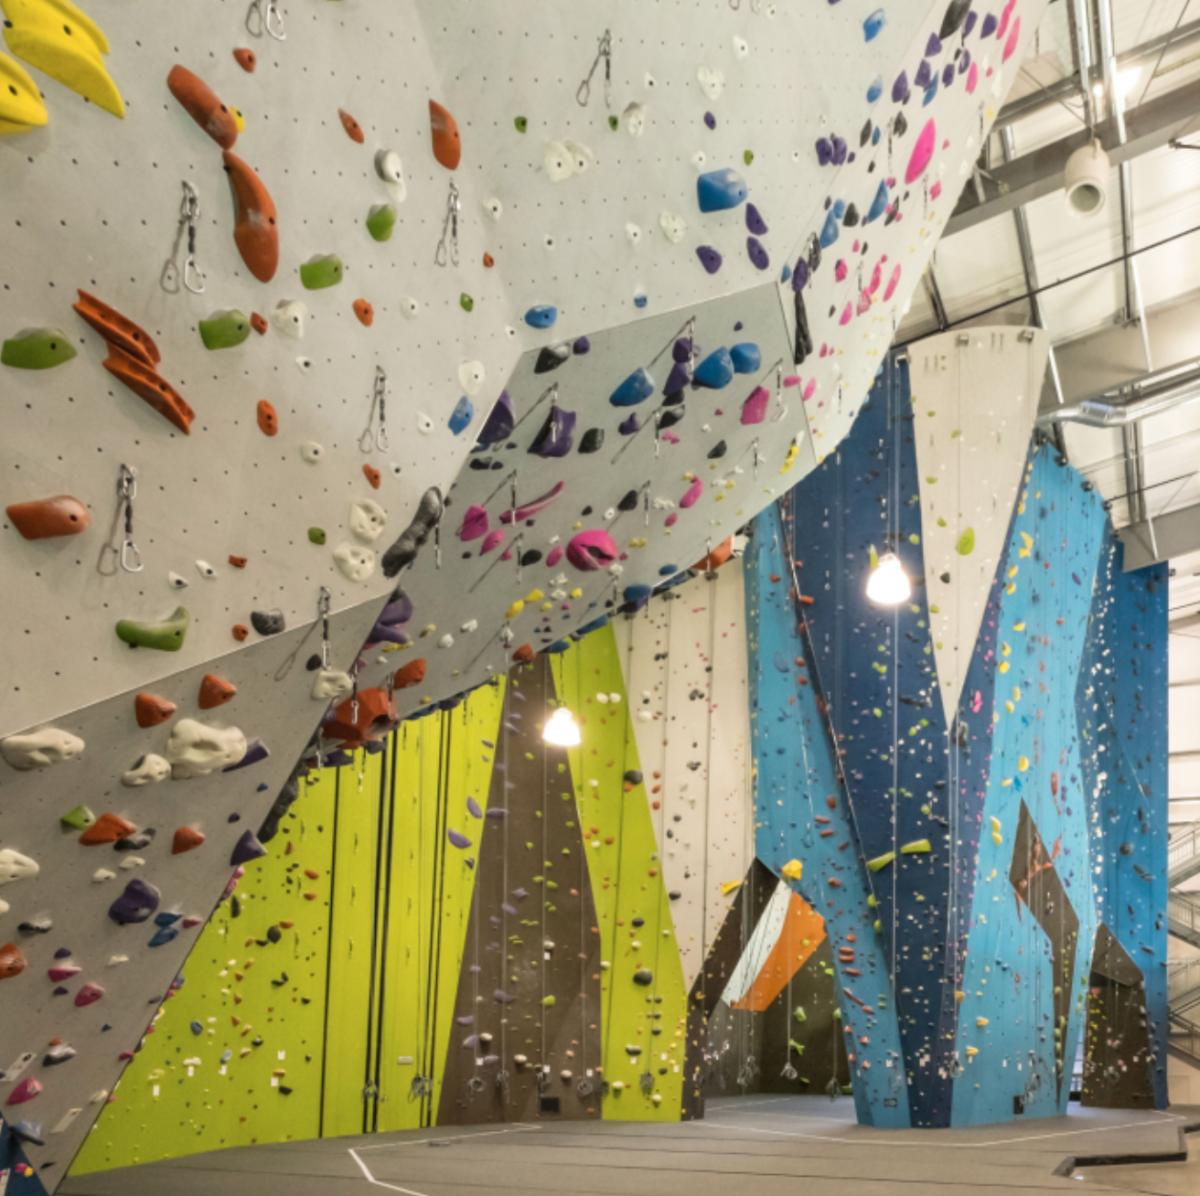 A Beginners Guide to Rock Climbing